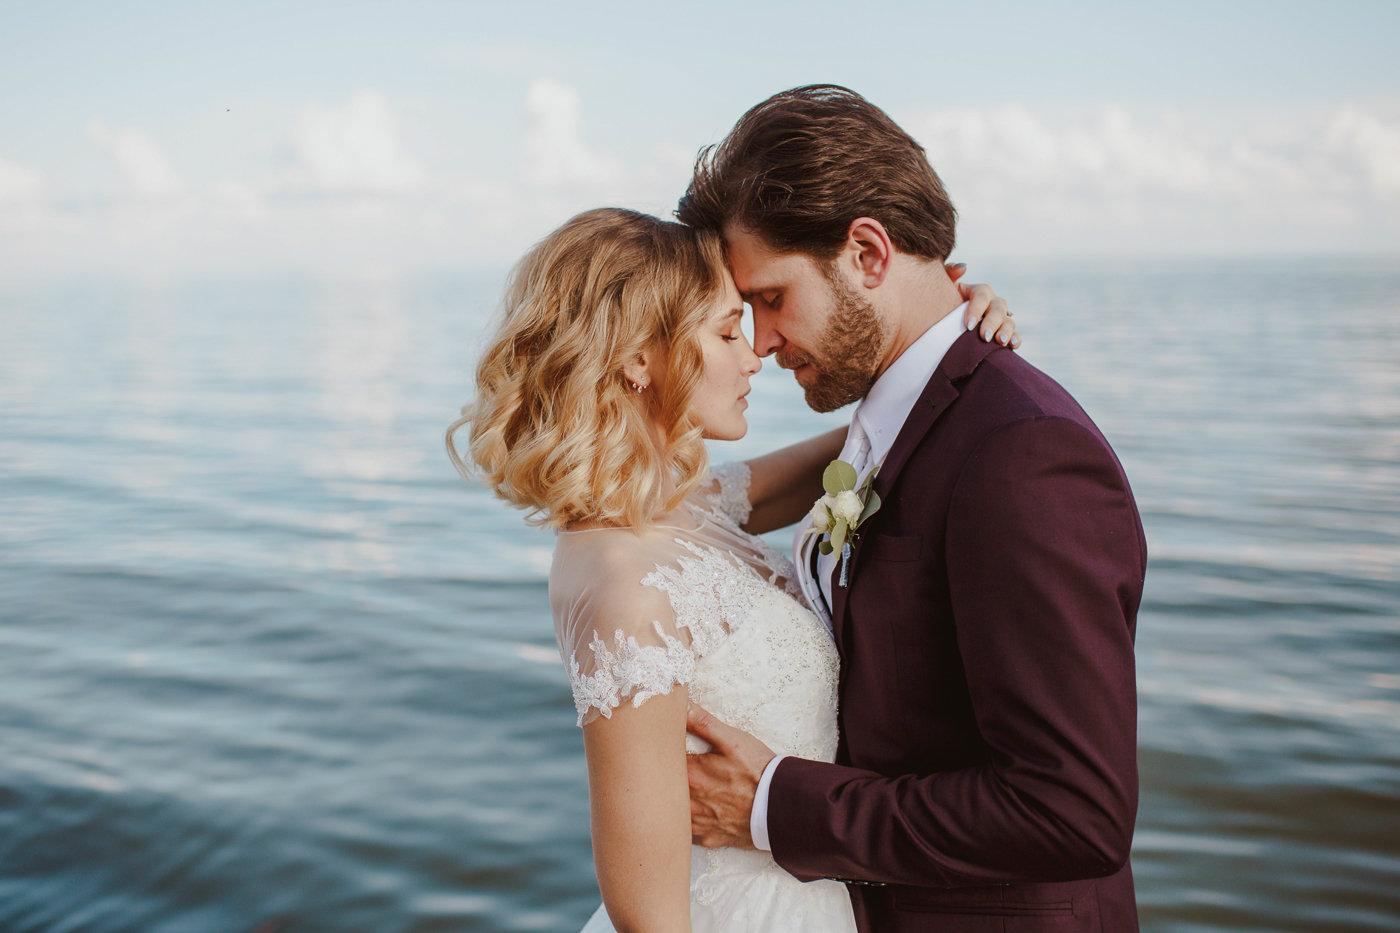 destination-wedding-photography-42.jpg